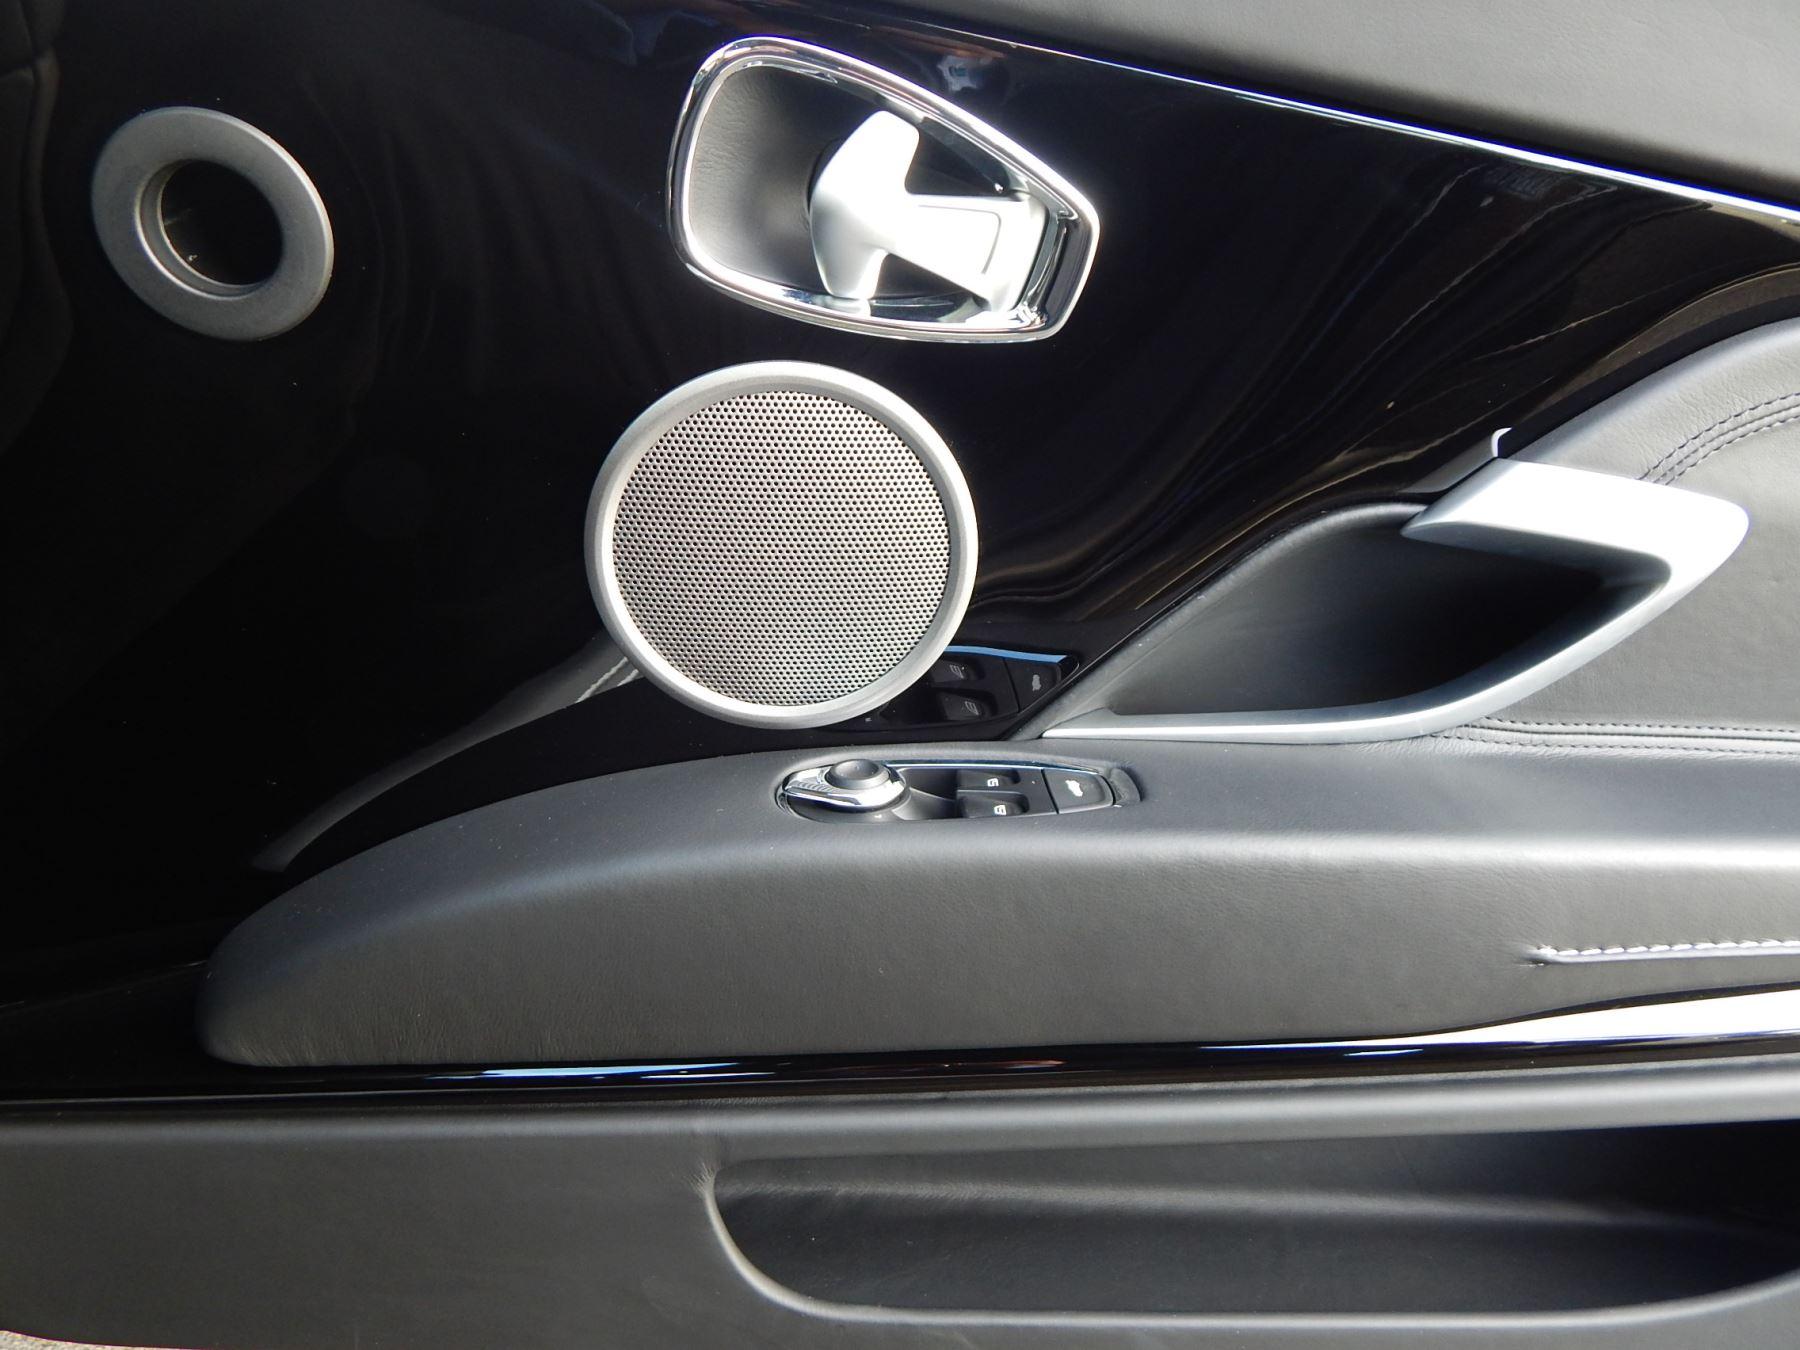 Aston Martin DB11 V12 2dr Touchtronic image 16